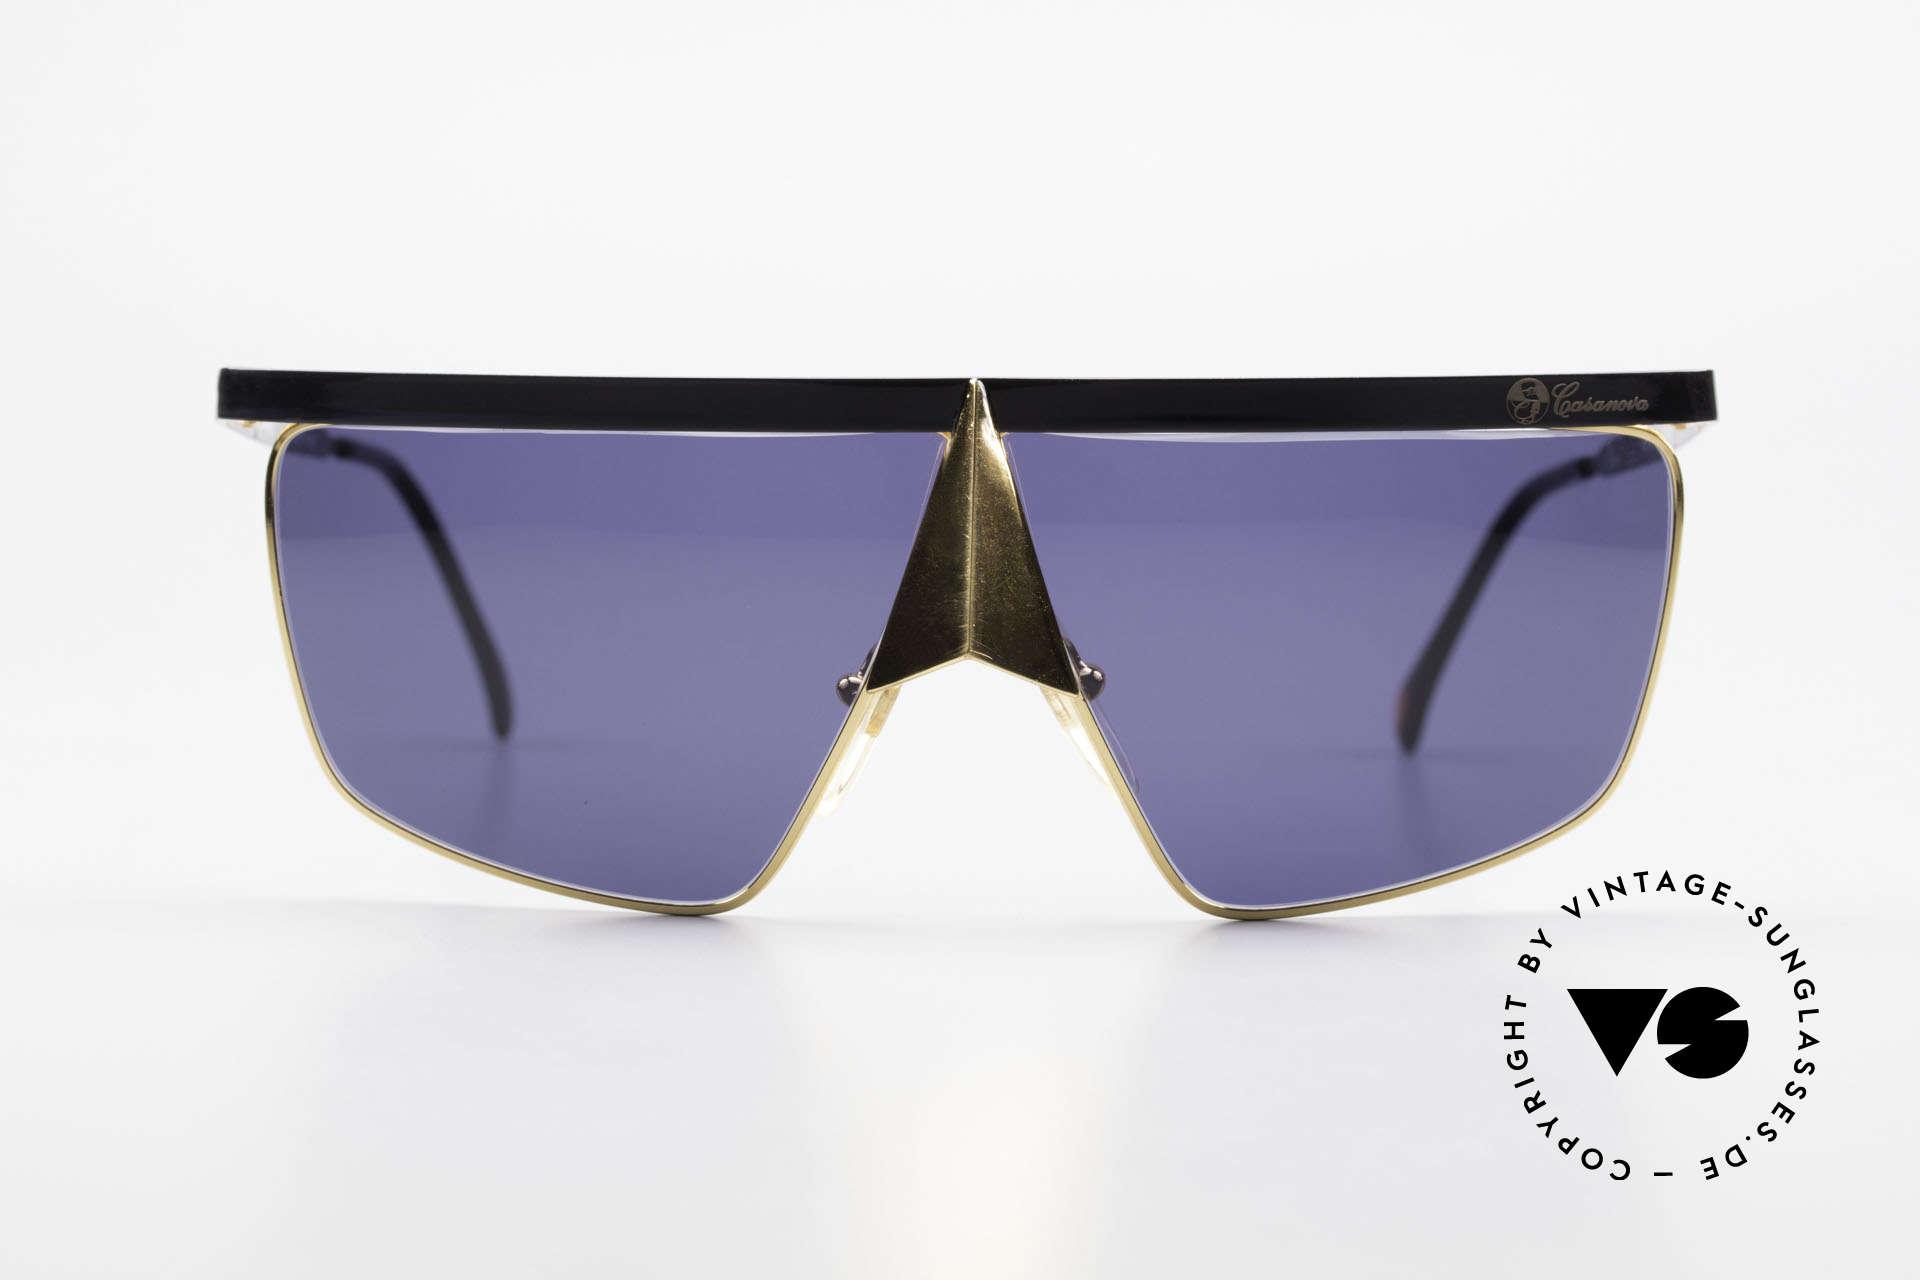 Casanova FC10 24kt Noseguard Sunglasses, distinctive Venetian design in style of the 18th century, Made for Men and Women